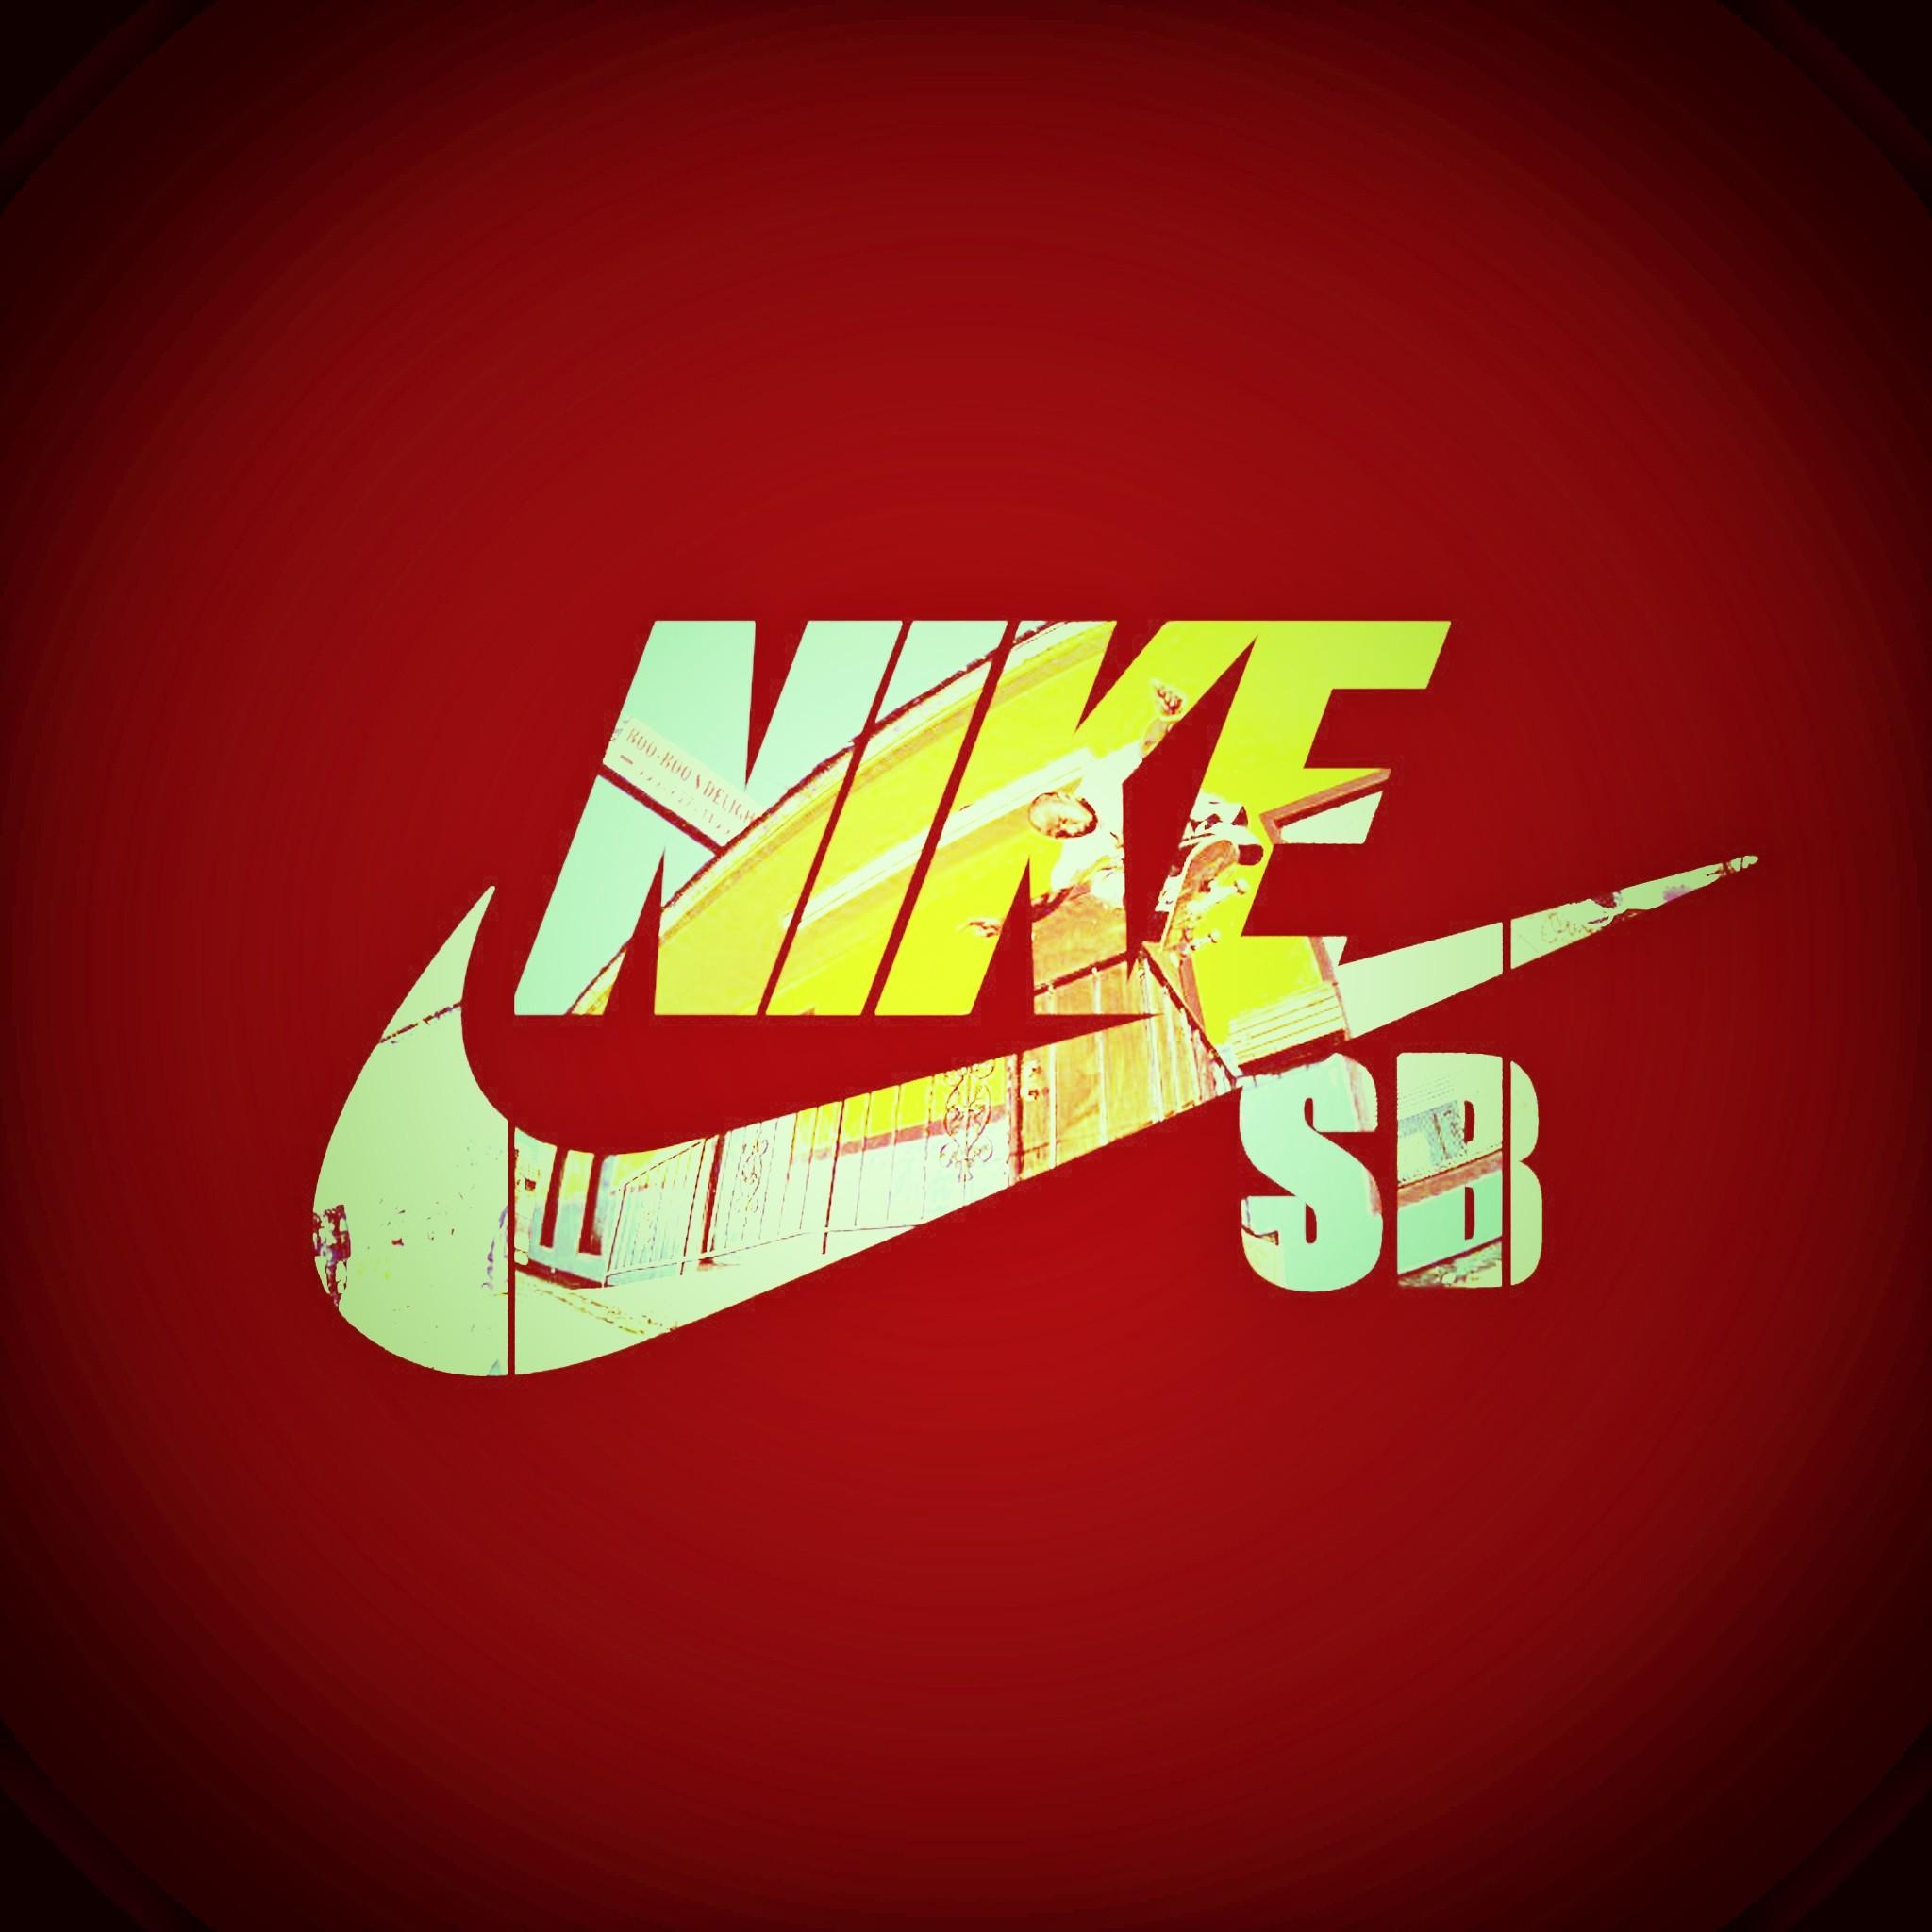 HD Wallpaper of My Ipad Retina Hd Nike Sb Logo JPG, Desktop Wallpaper My  Ipad